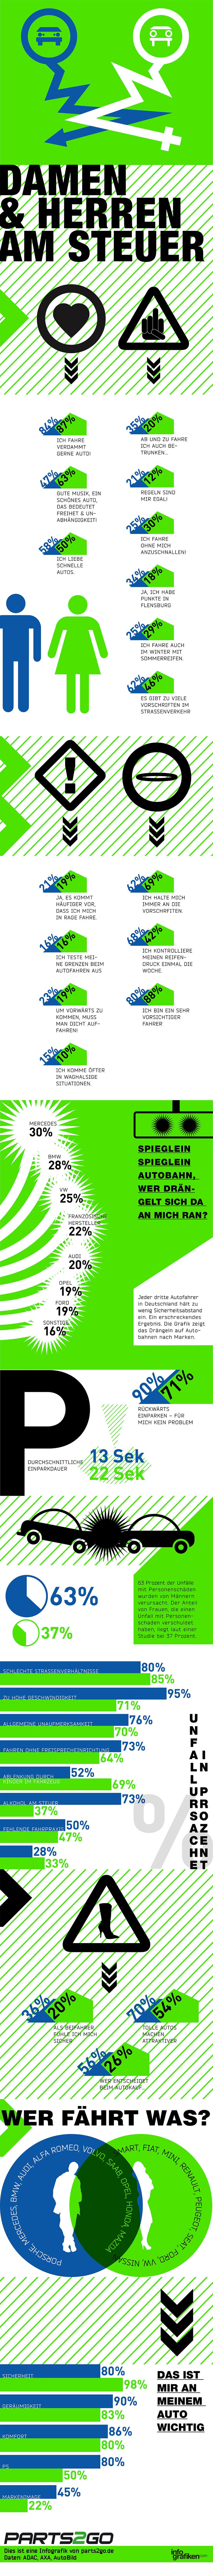 Infografik: Wer fährt besser?